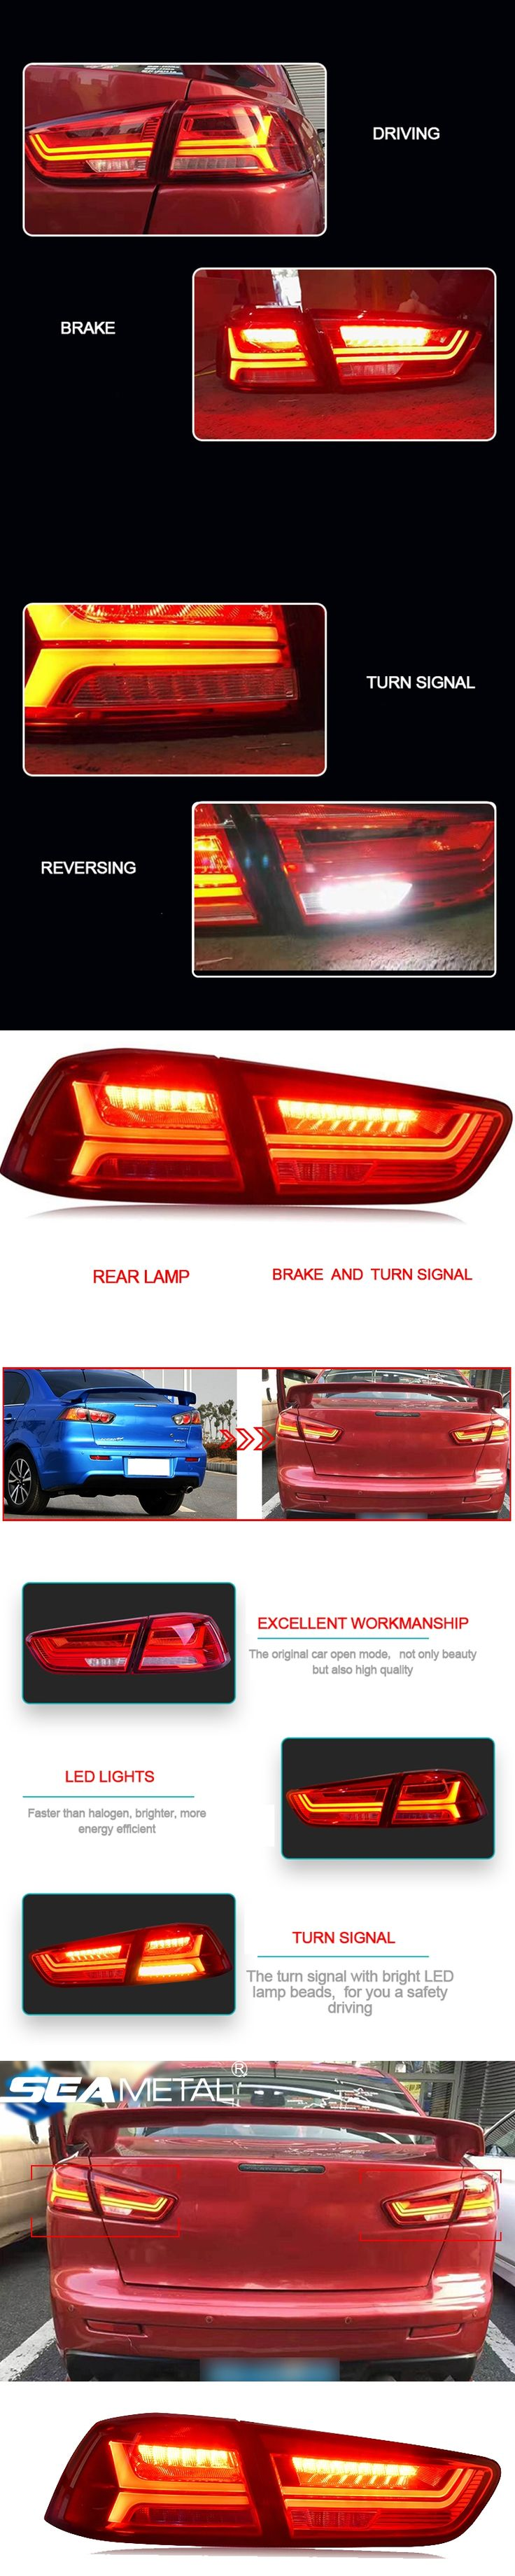 Car Taillight For Mitsubishi Lancer 2009 2010 2011 2012 2013 2014 2015 2016 LED Car Rear lamp Kit Tail lights Assembly Auto Lamp